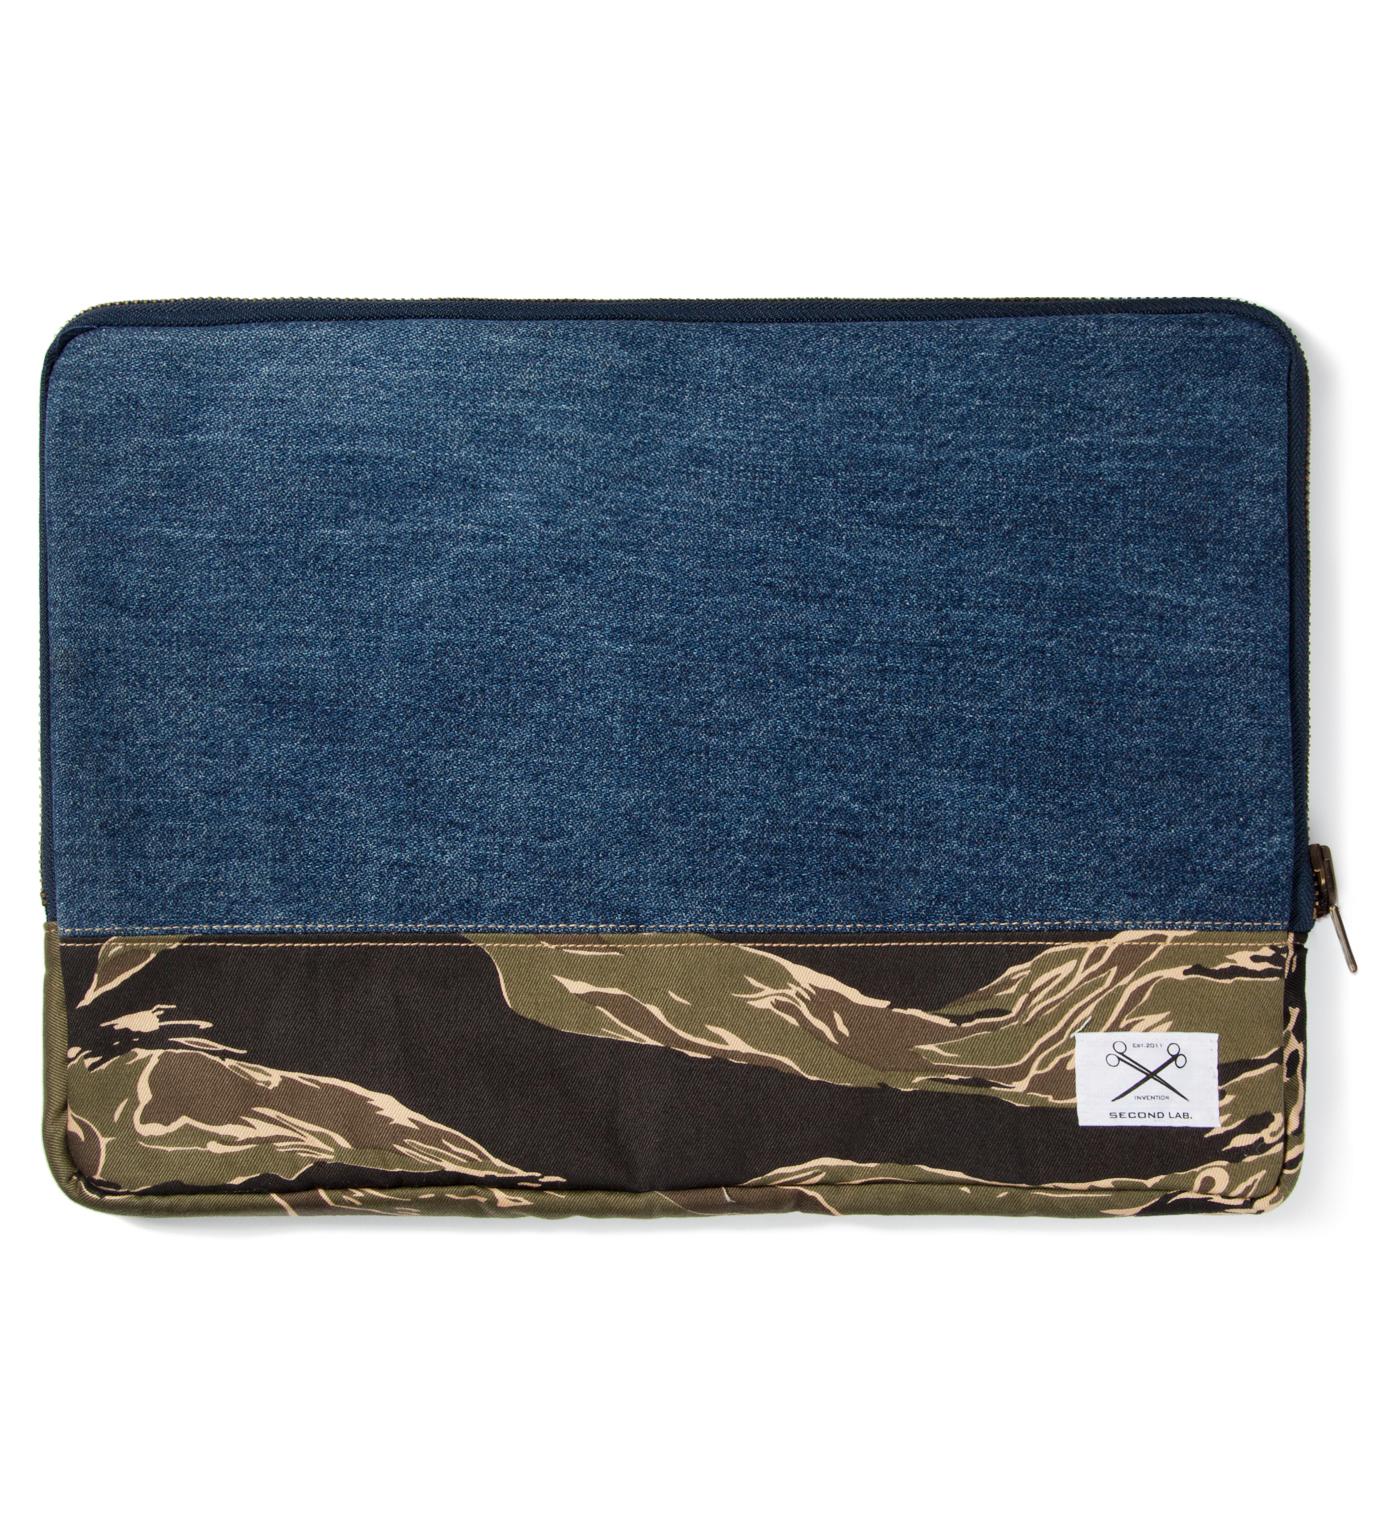 SECOND LAB Tiger Stripe Clutch Bag